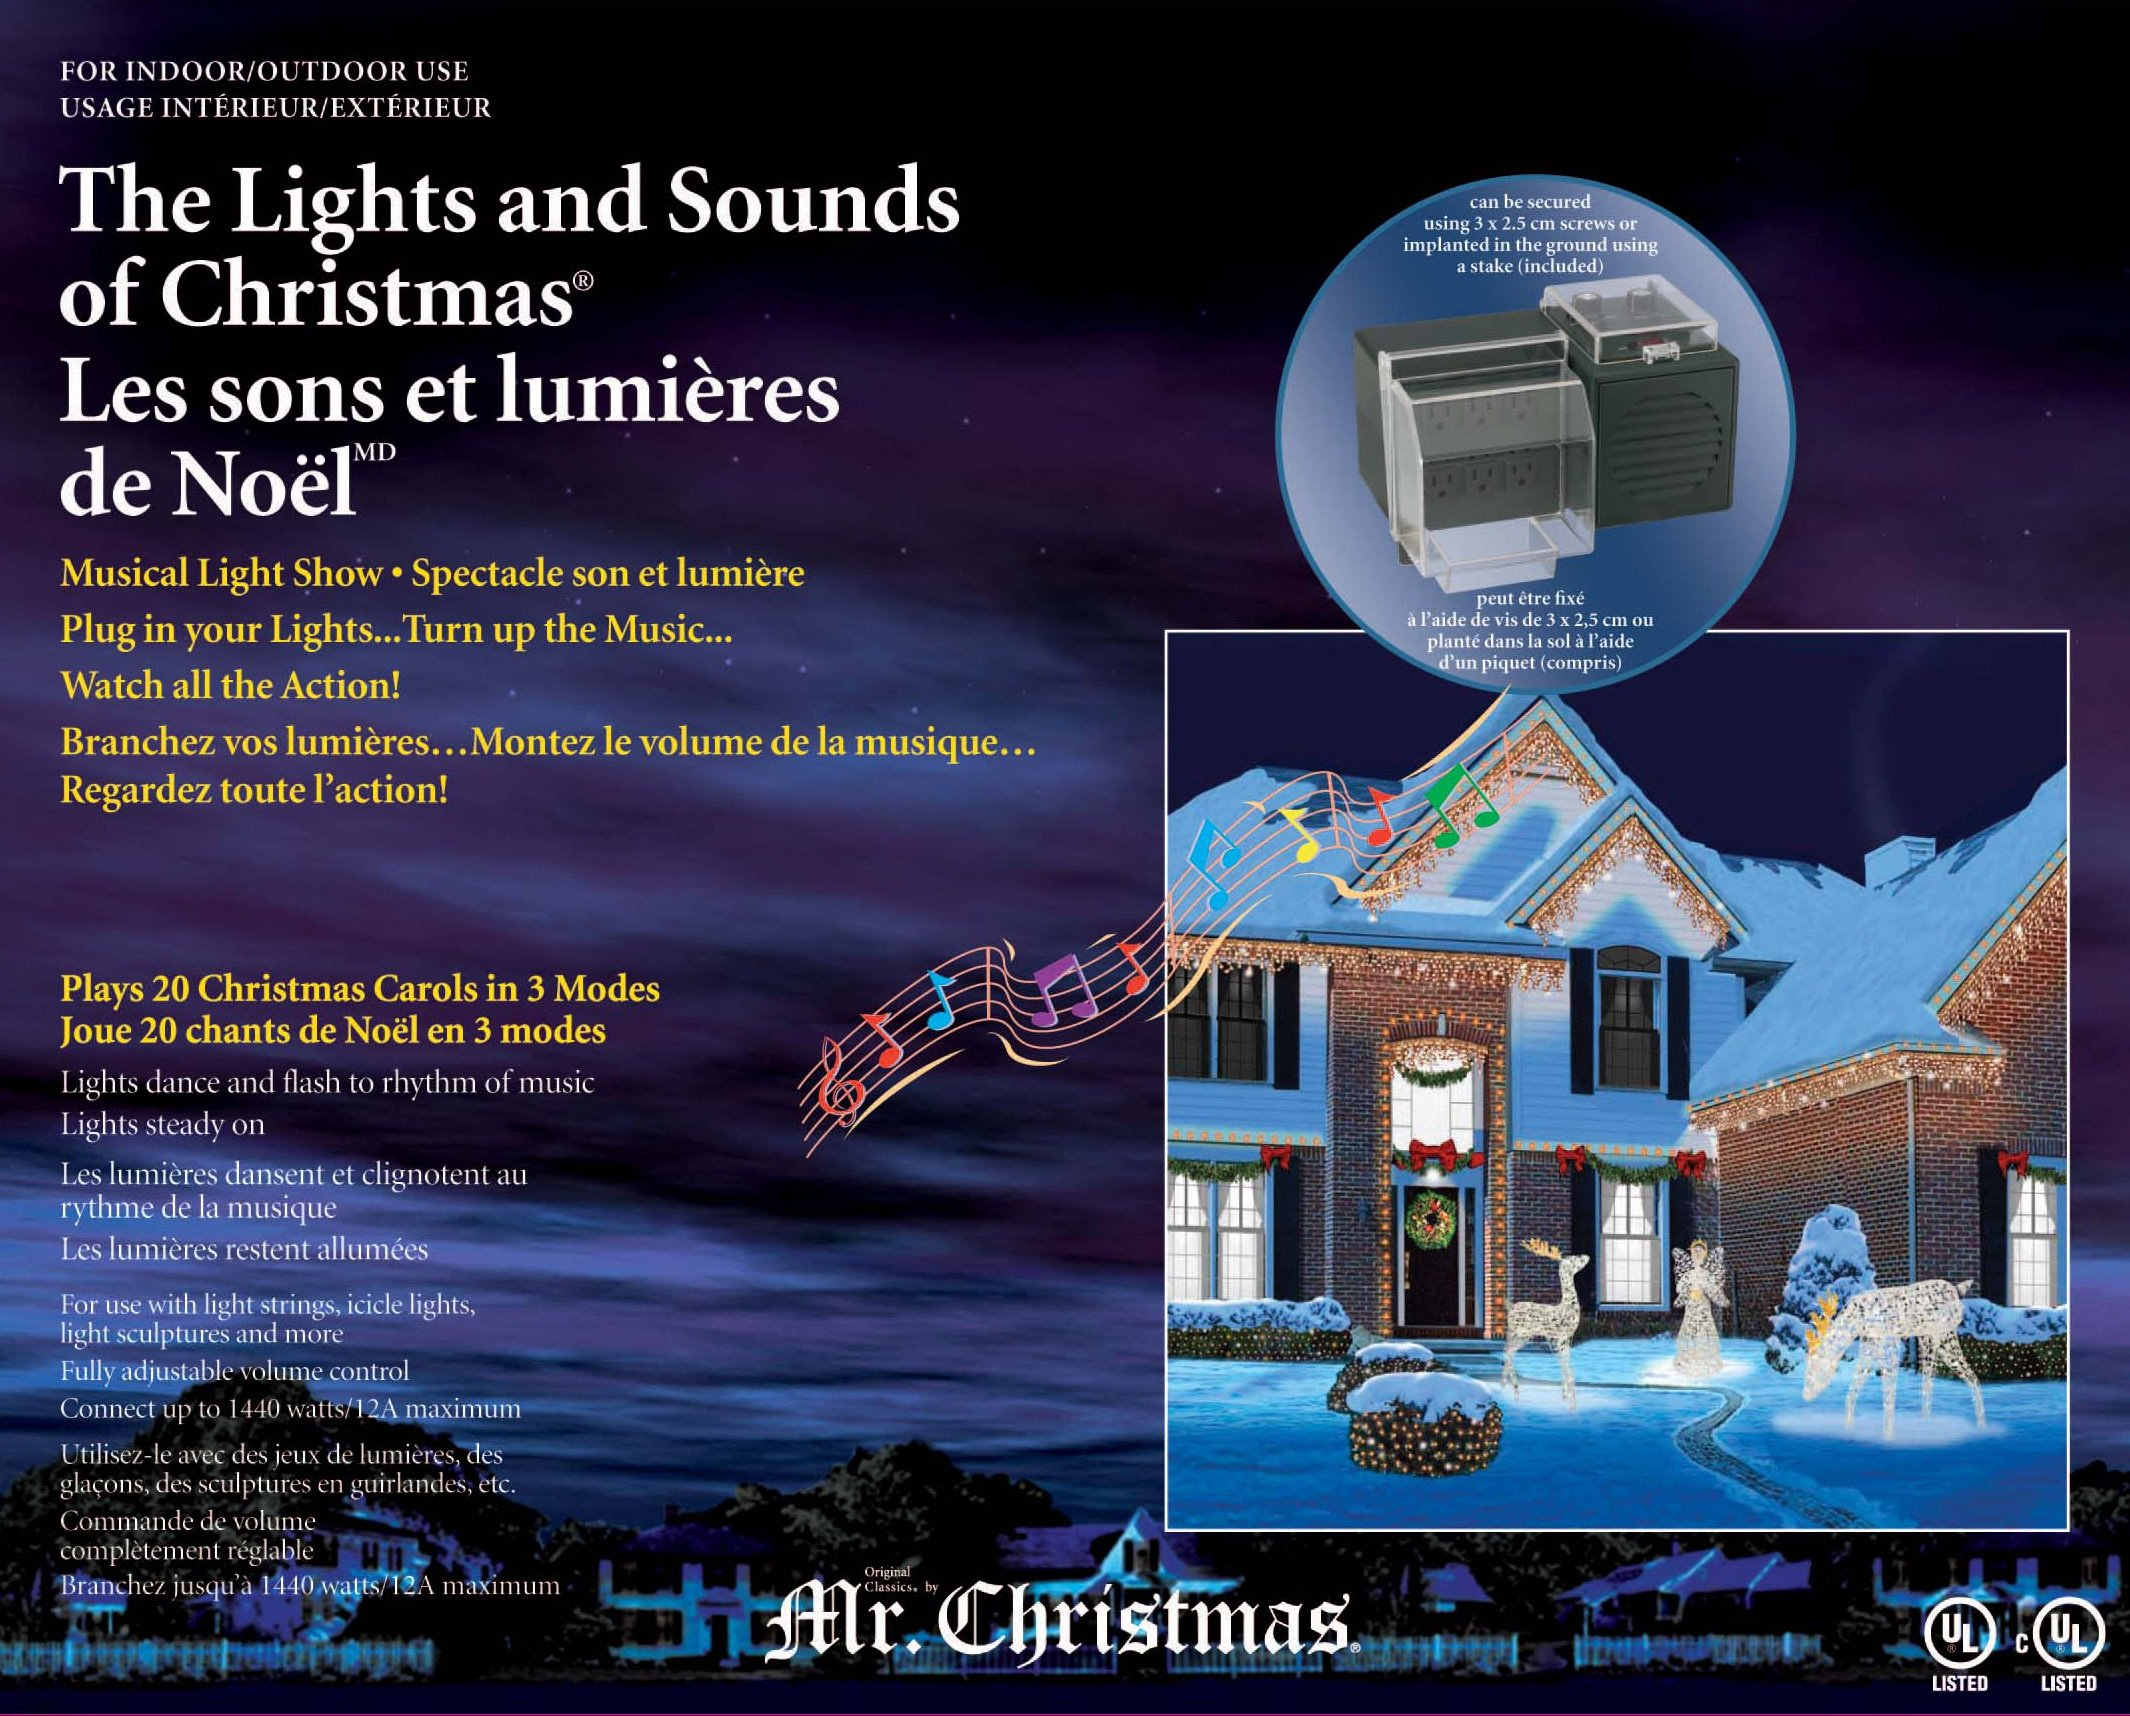 Mr. Christmas Lights and Sounds of Christmas, Outdoor by Mr. Christmas (Image #2)